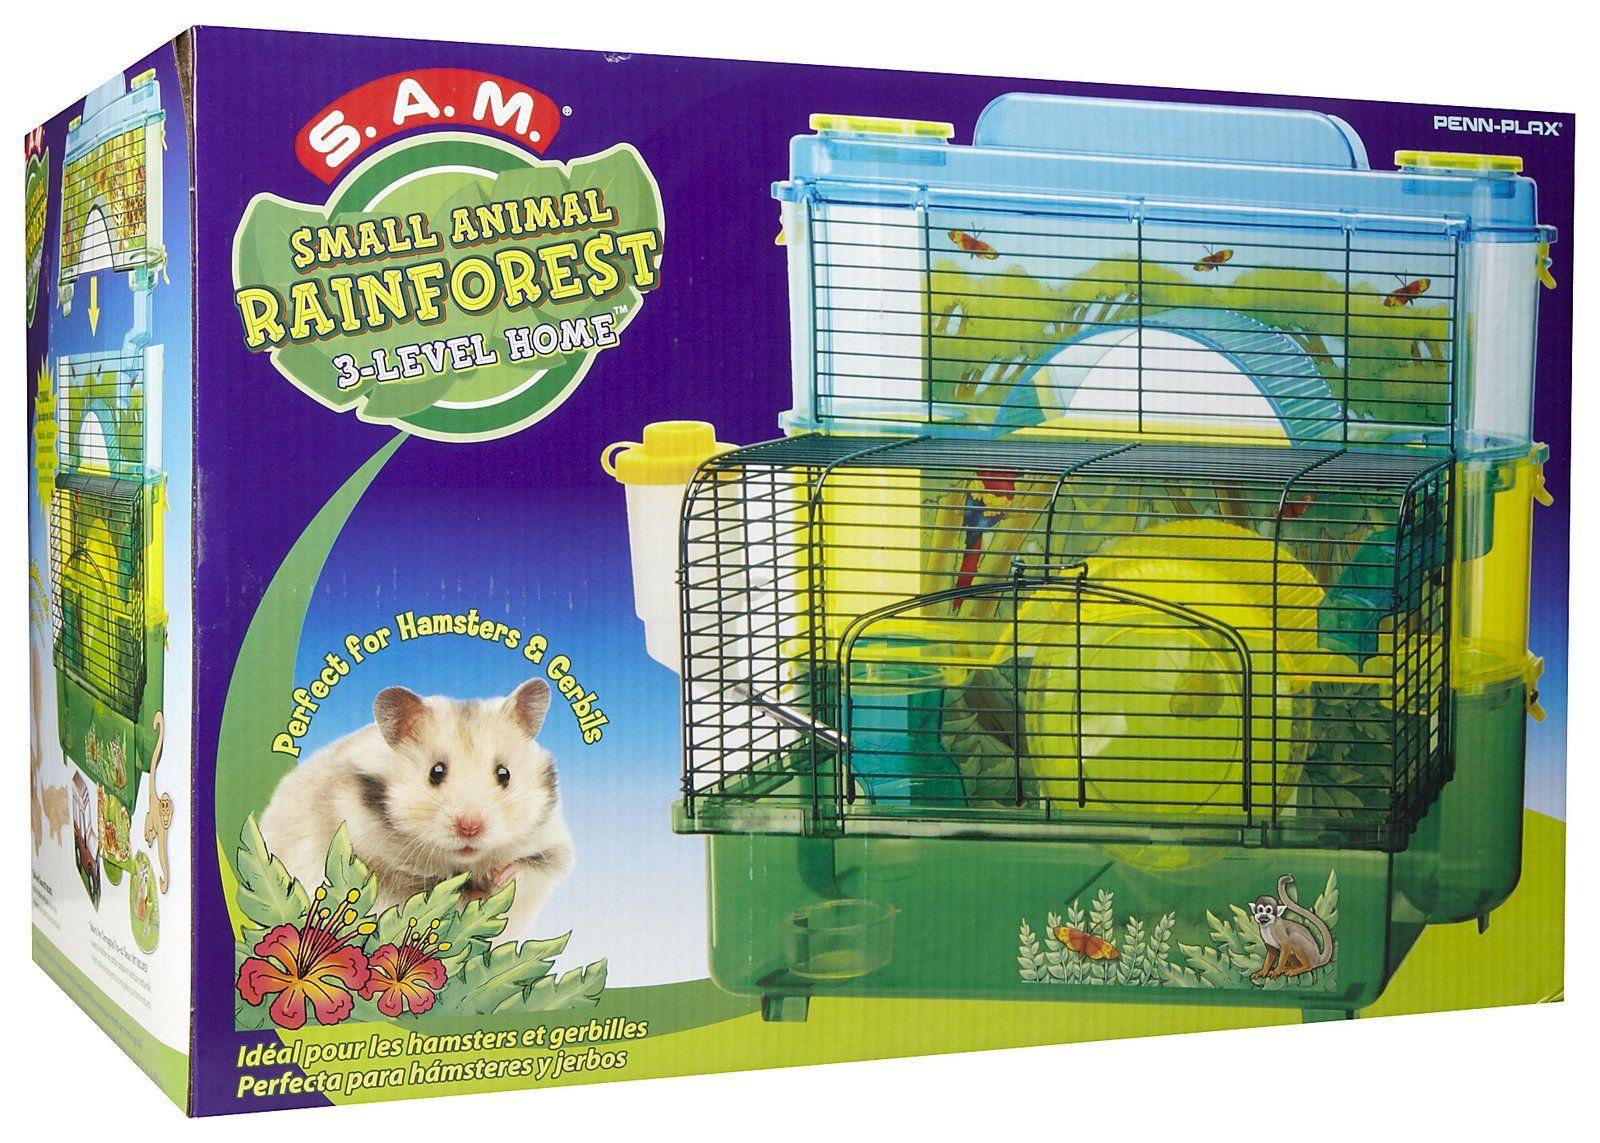 Penn Plax Rainforest Jungle Hamster Home Hamster House Hamster Small Pets